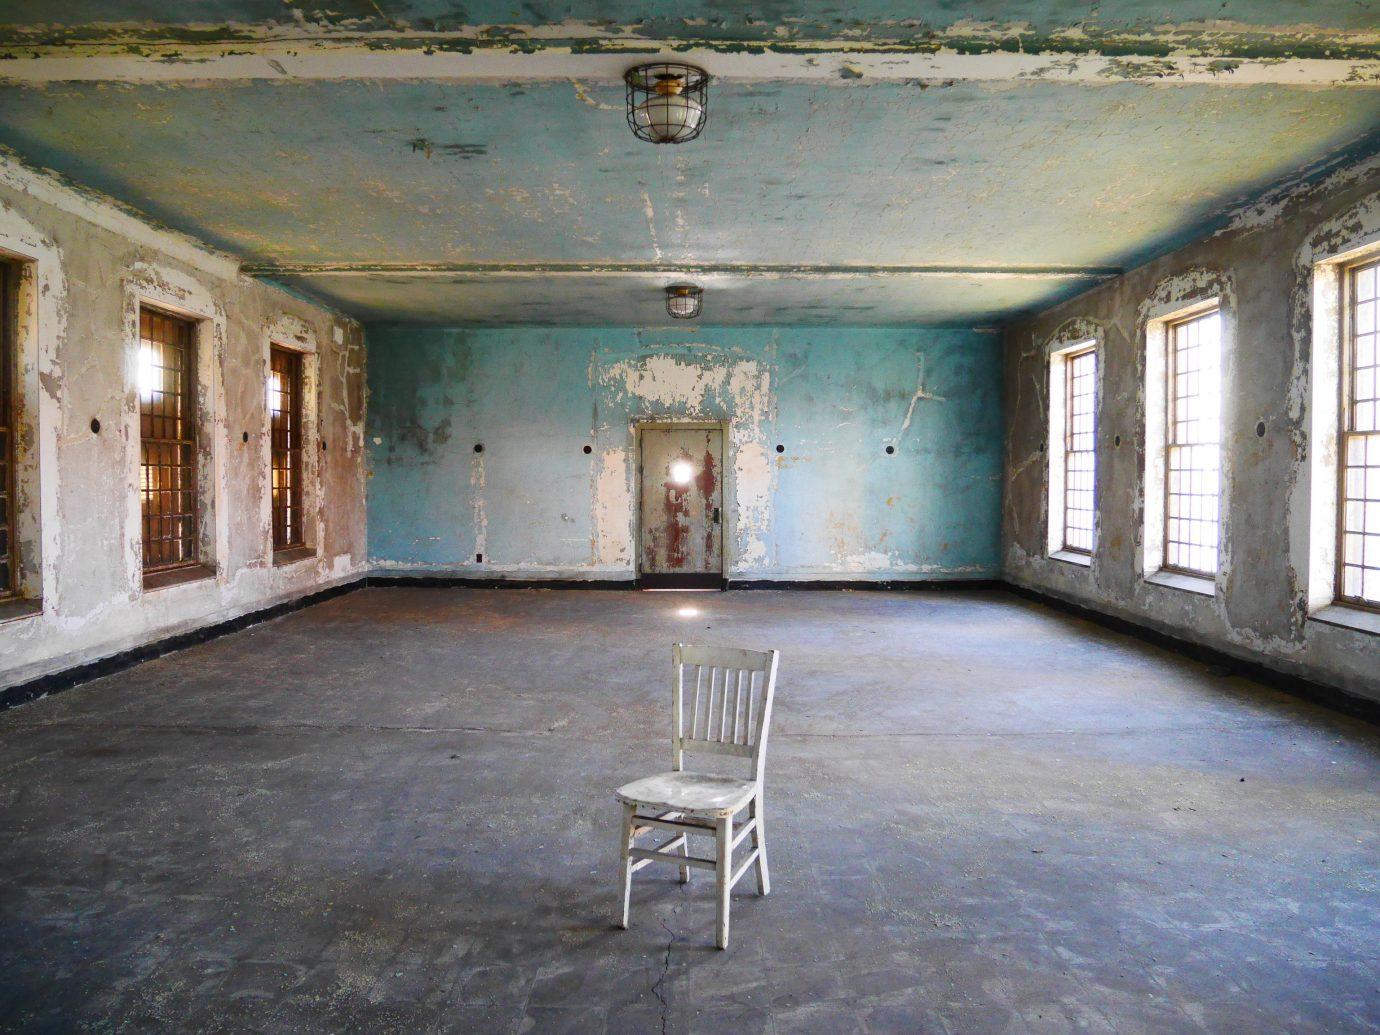 Offbeat ground building property house indoor room estate urban area floor home mansion interior design farmhouse old empty